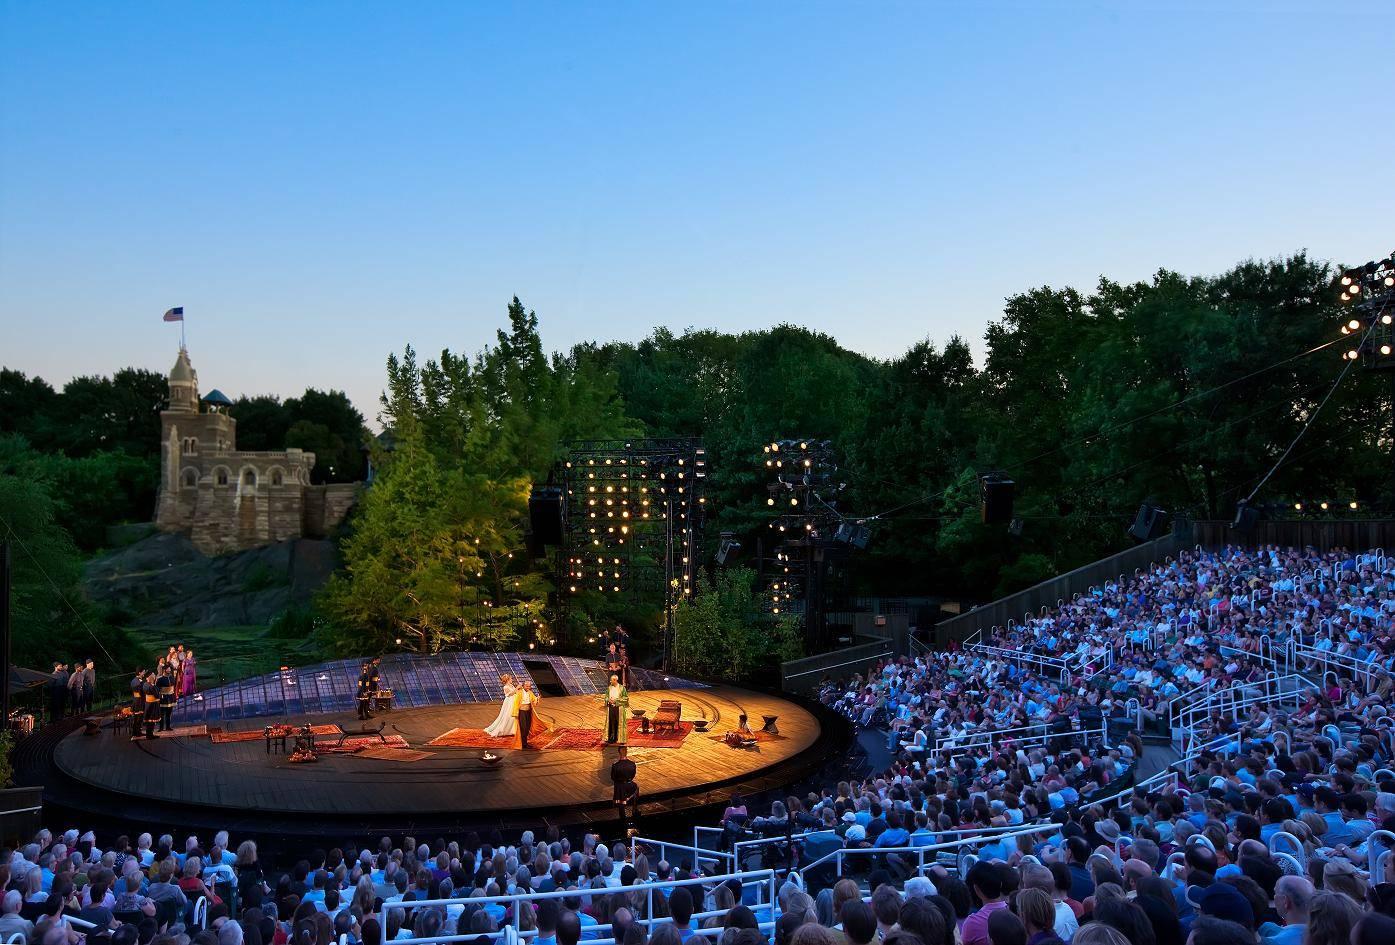 Enjoy Shakespeare in the Park